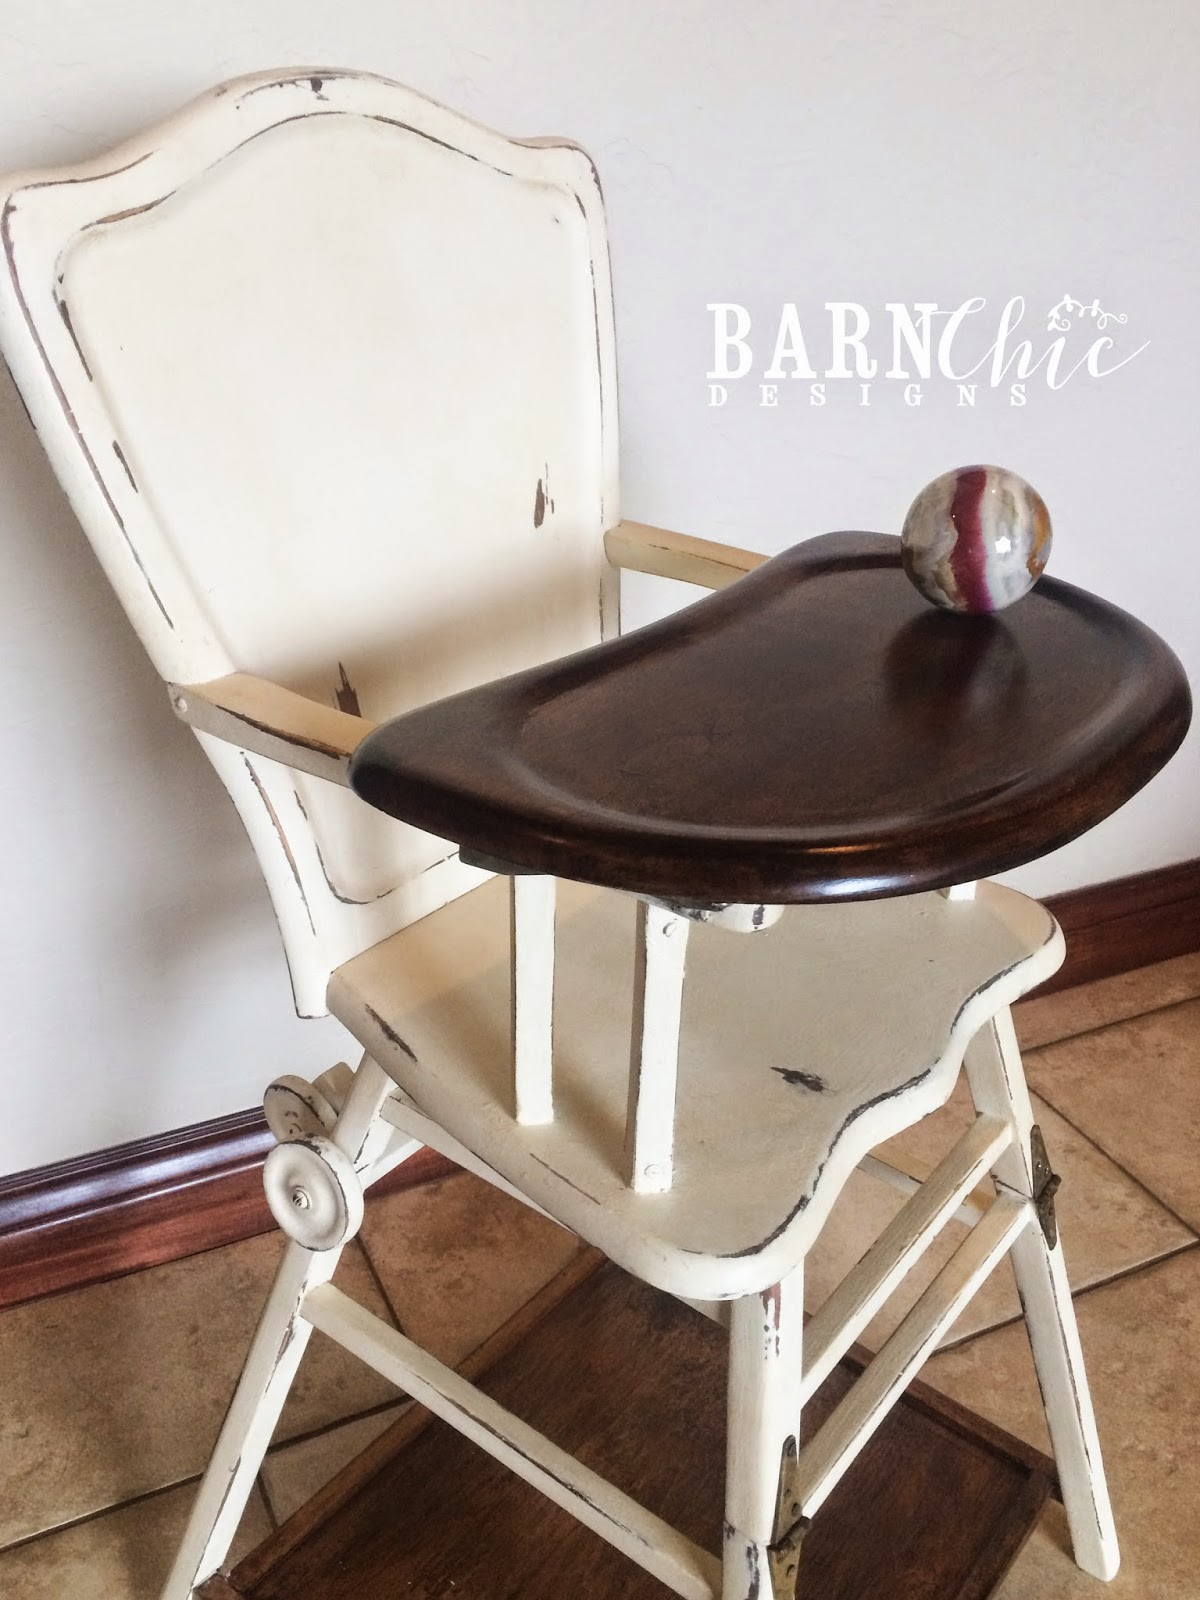 stylish high chair star trek captains barn chic designs the